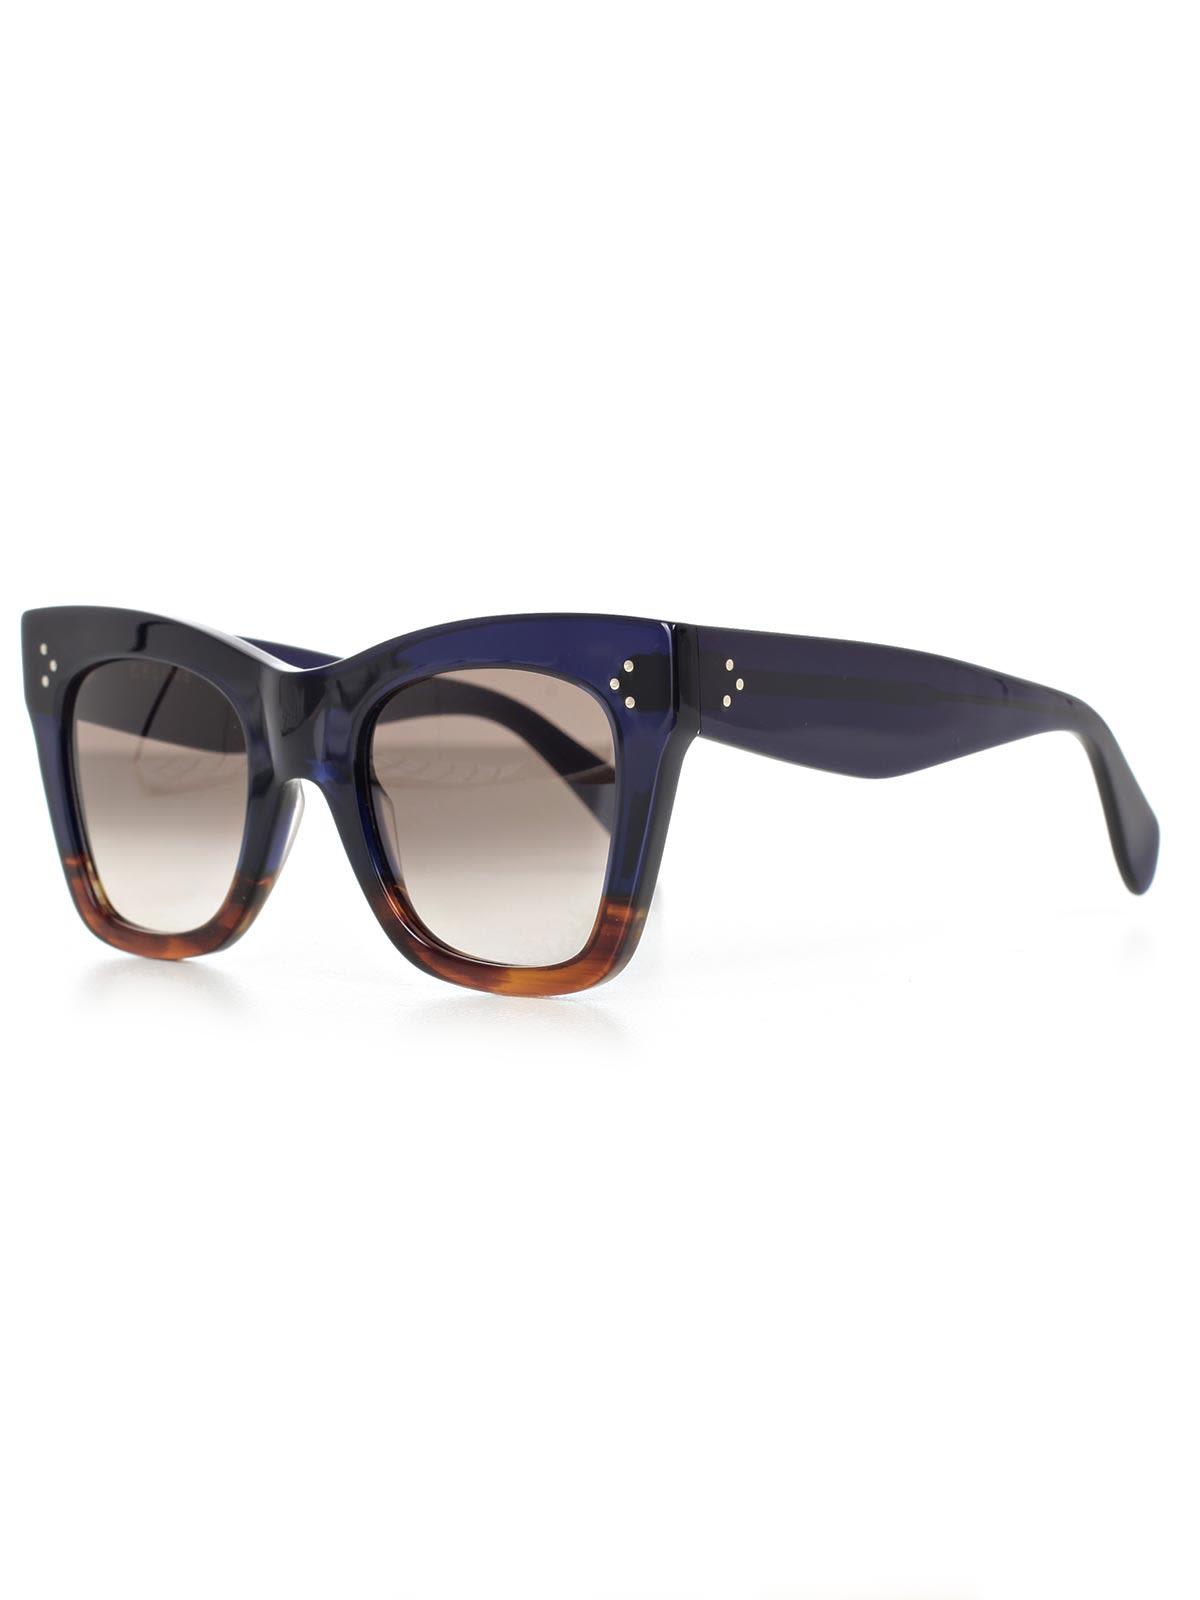 3b783599f07d Celine Sunglasses Antwerpen